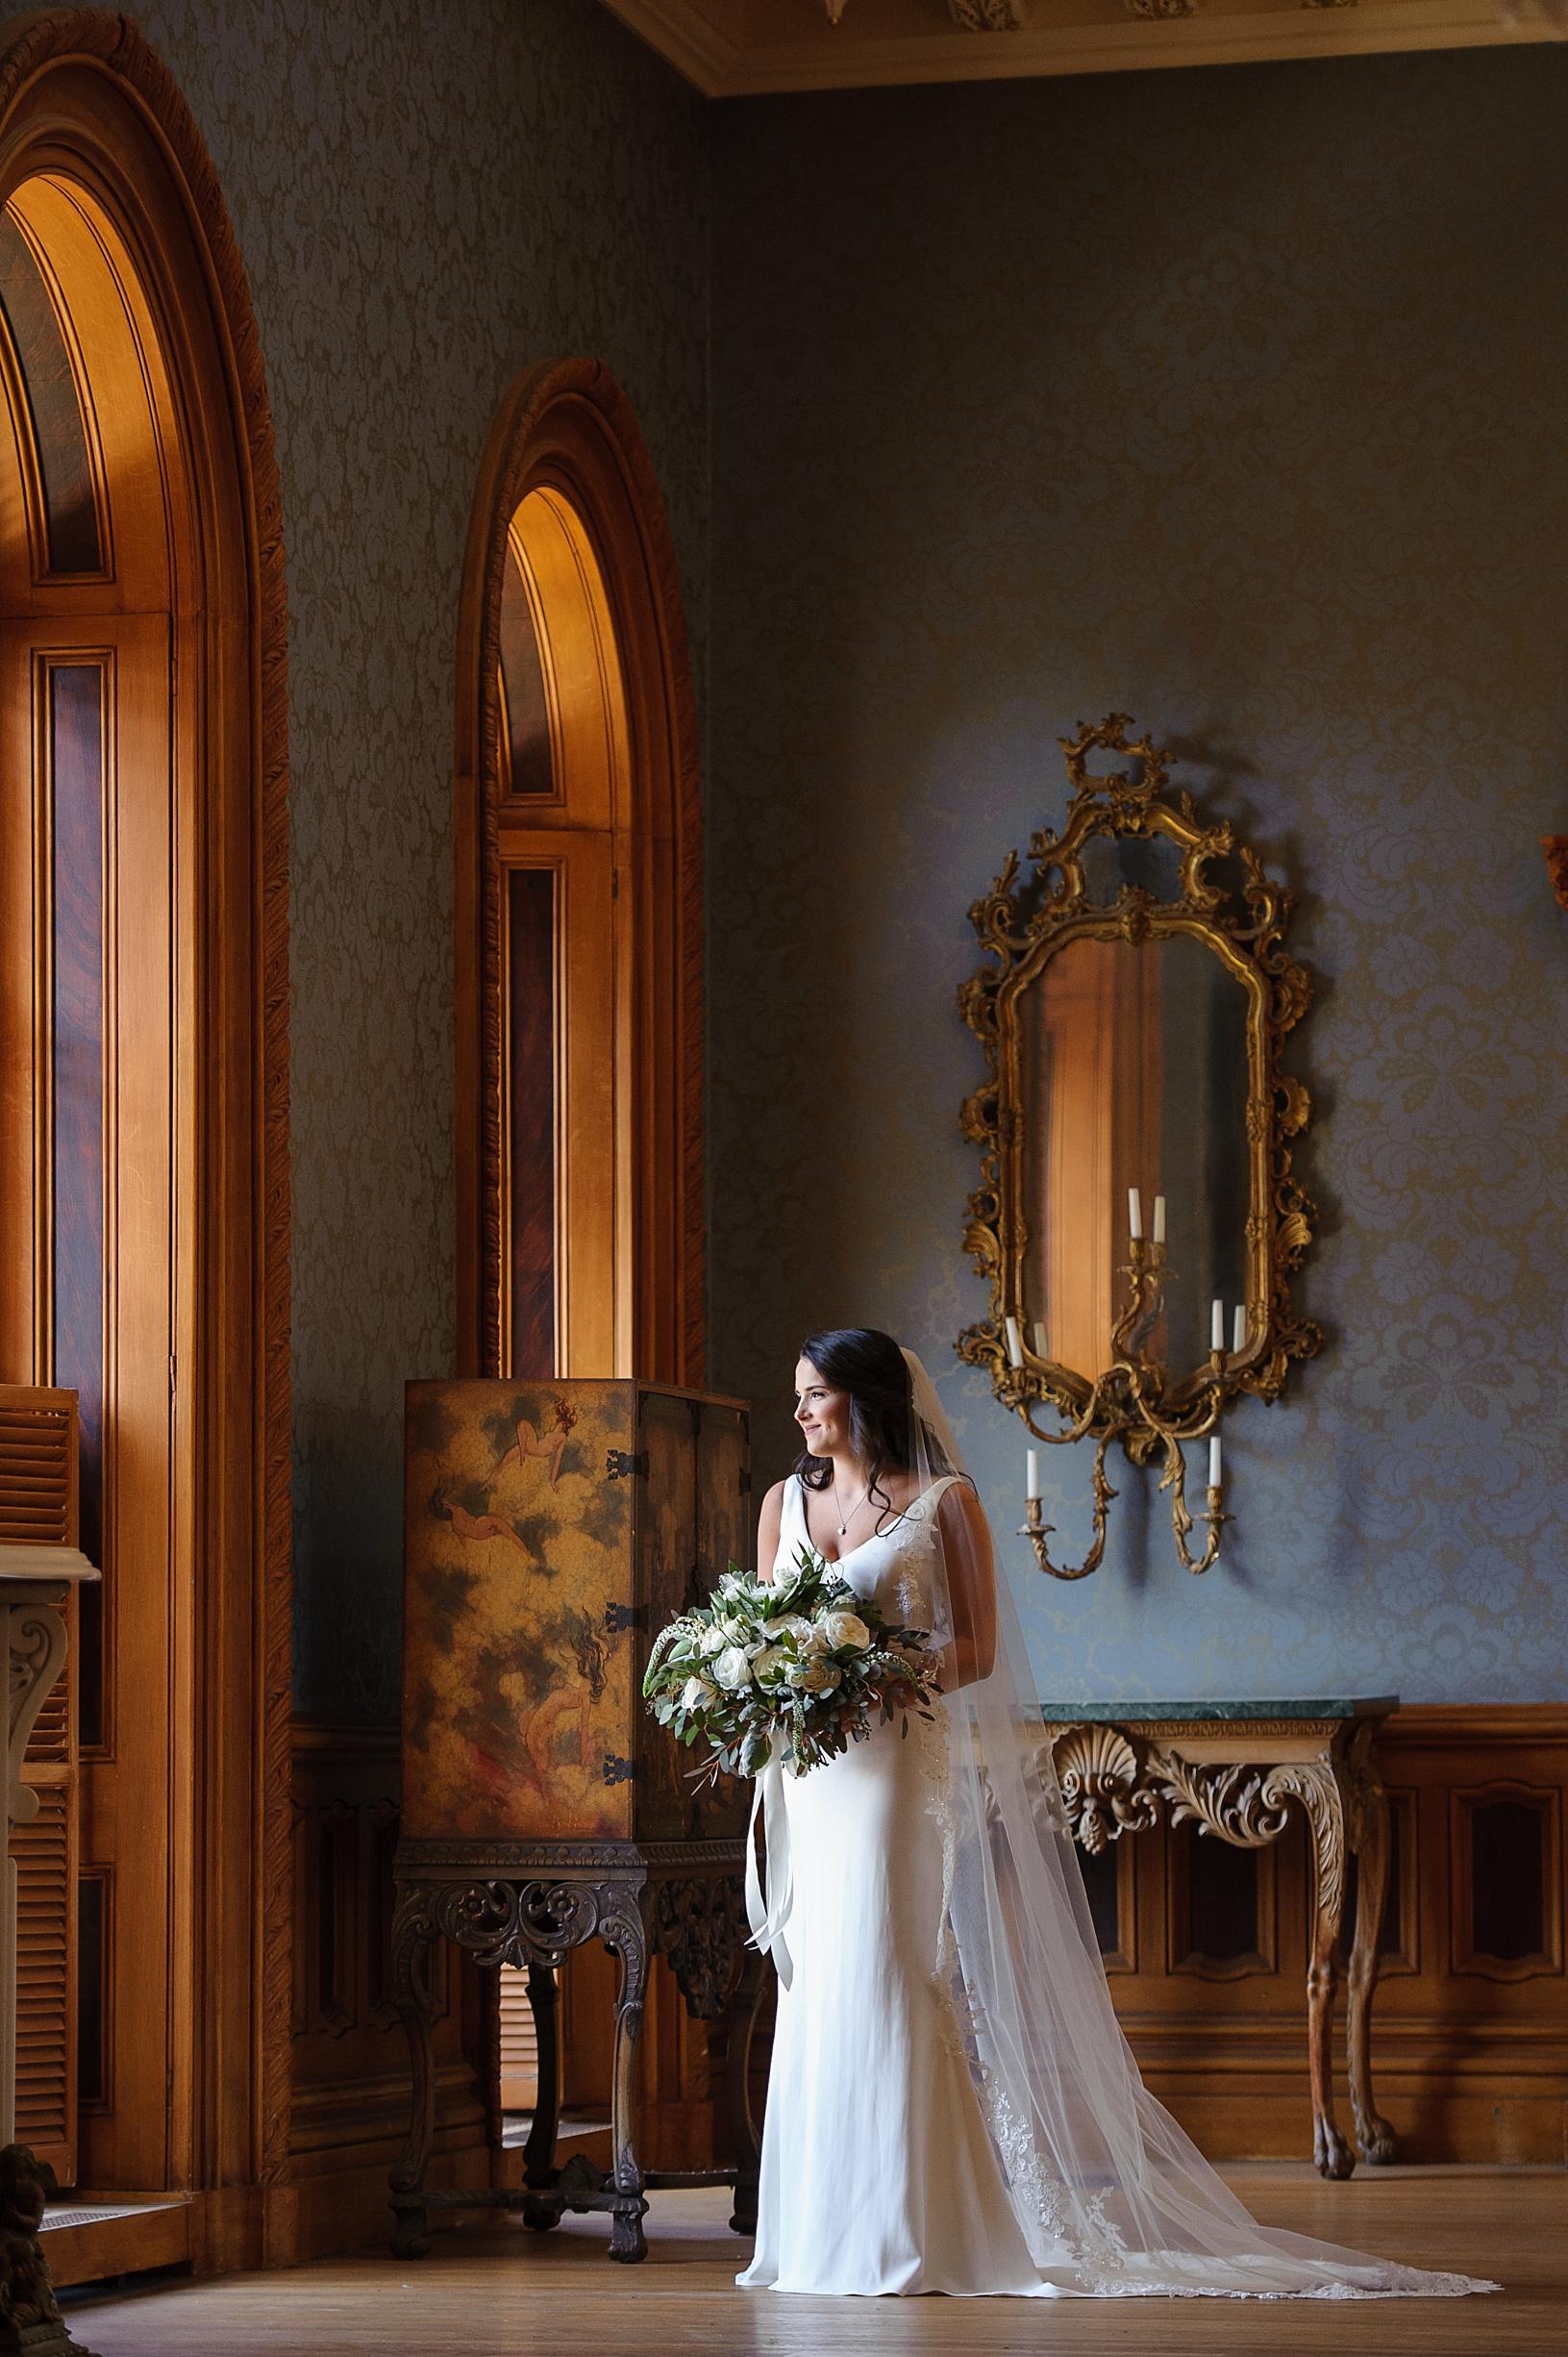 Royal Wedding with Outdoor Reception-2.JPG